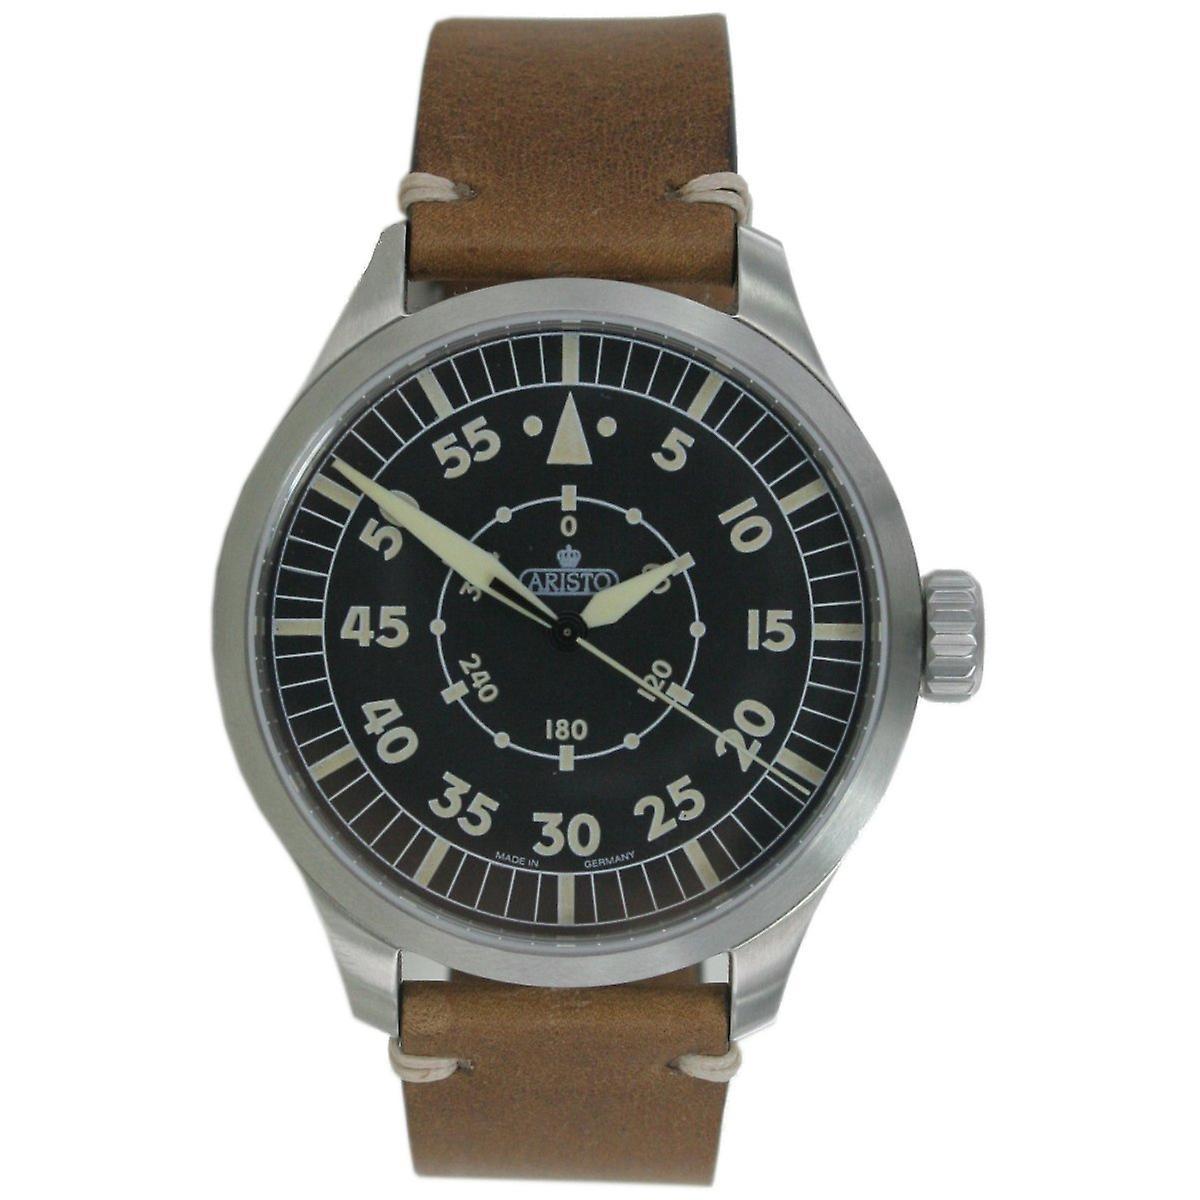 Aristo men's watch automatic Bracelet Watch 7 H 99 vintage 47 Navigator leather